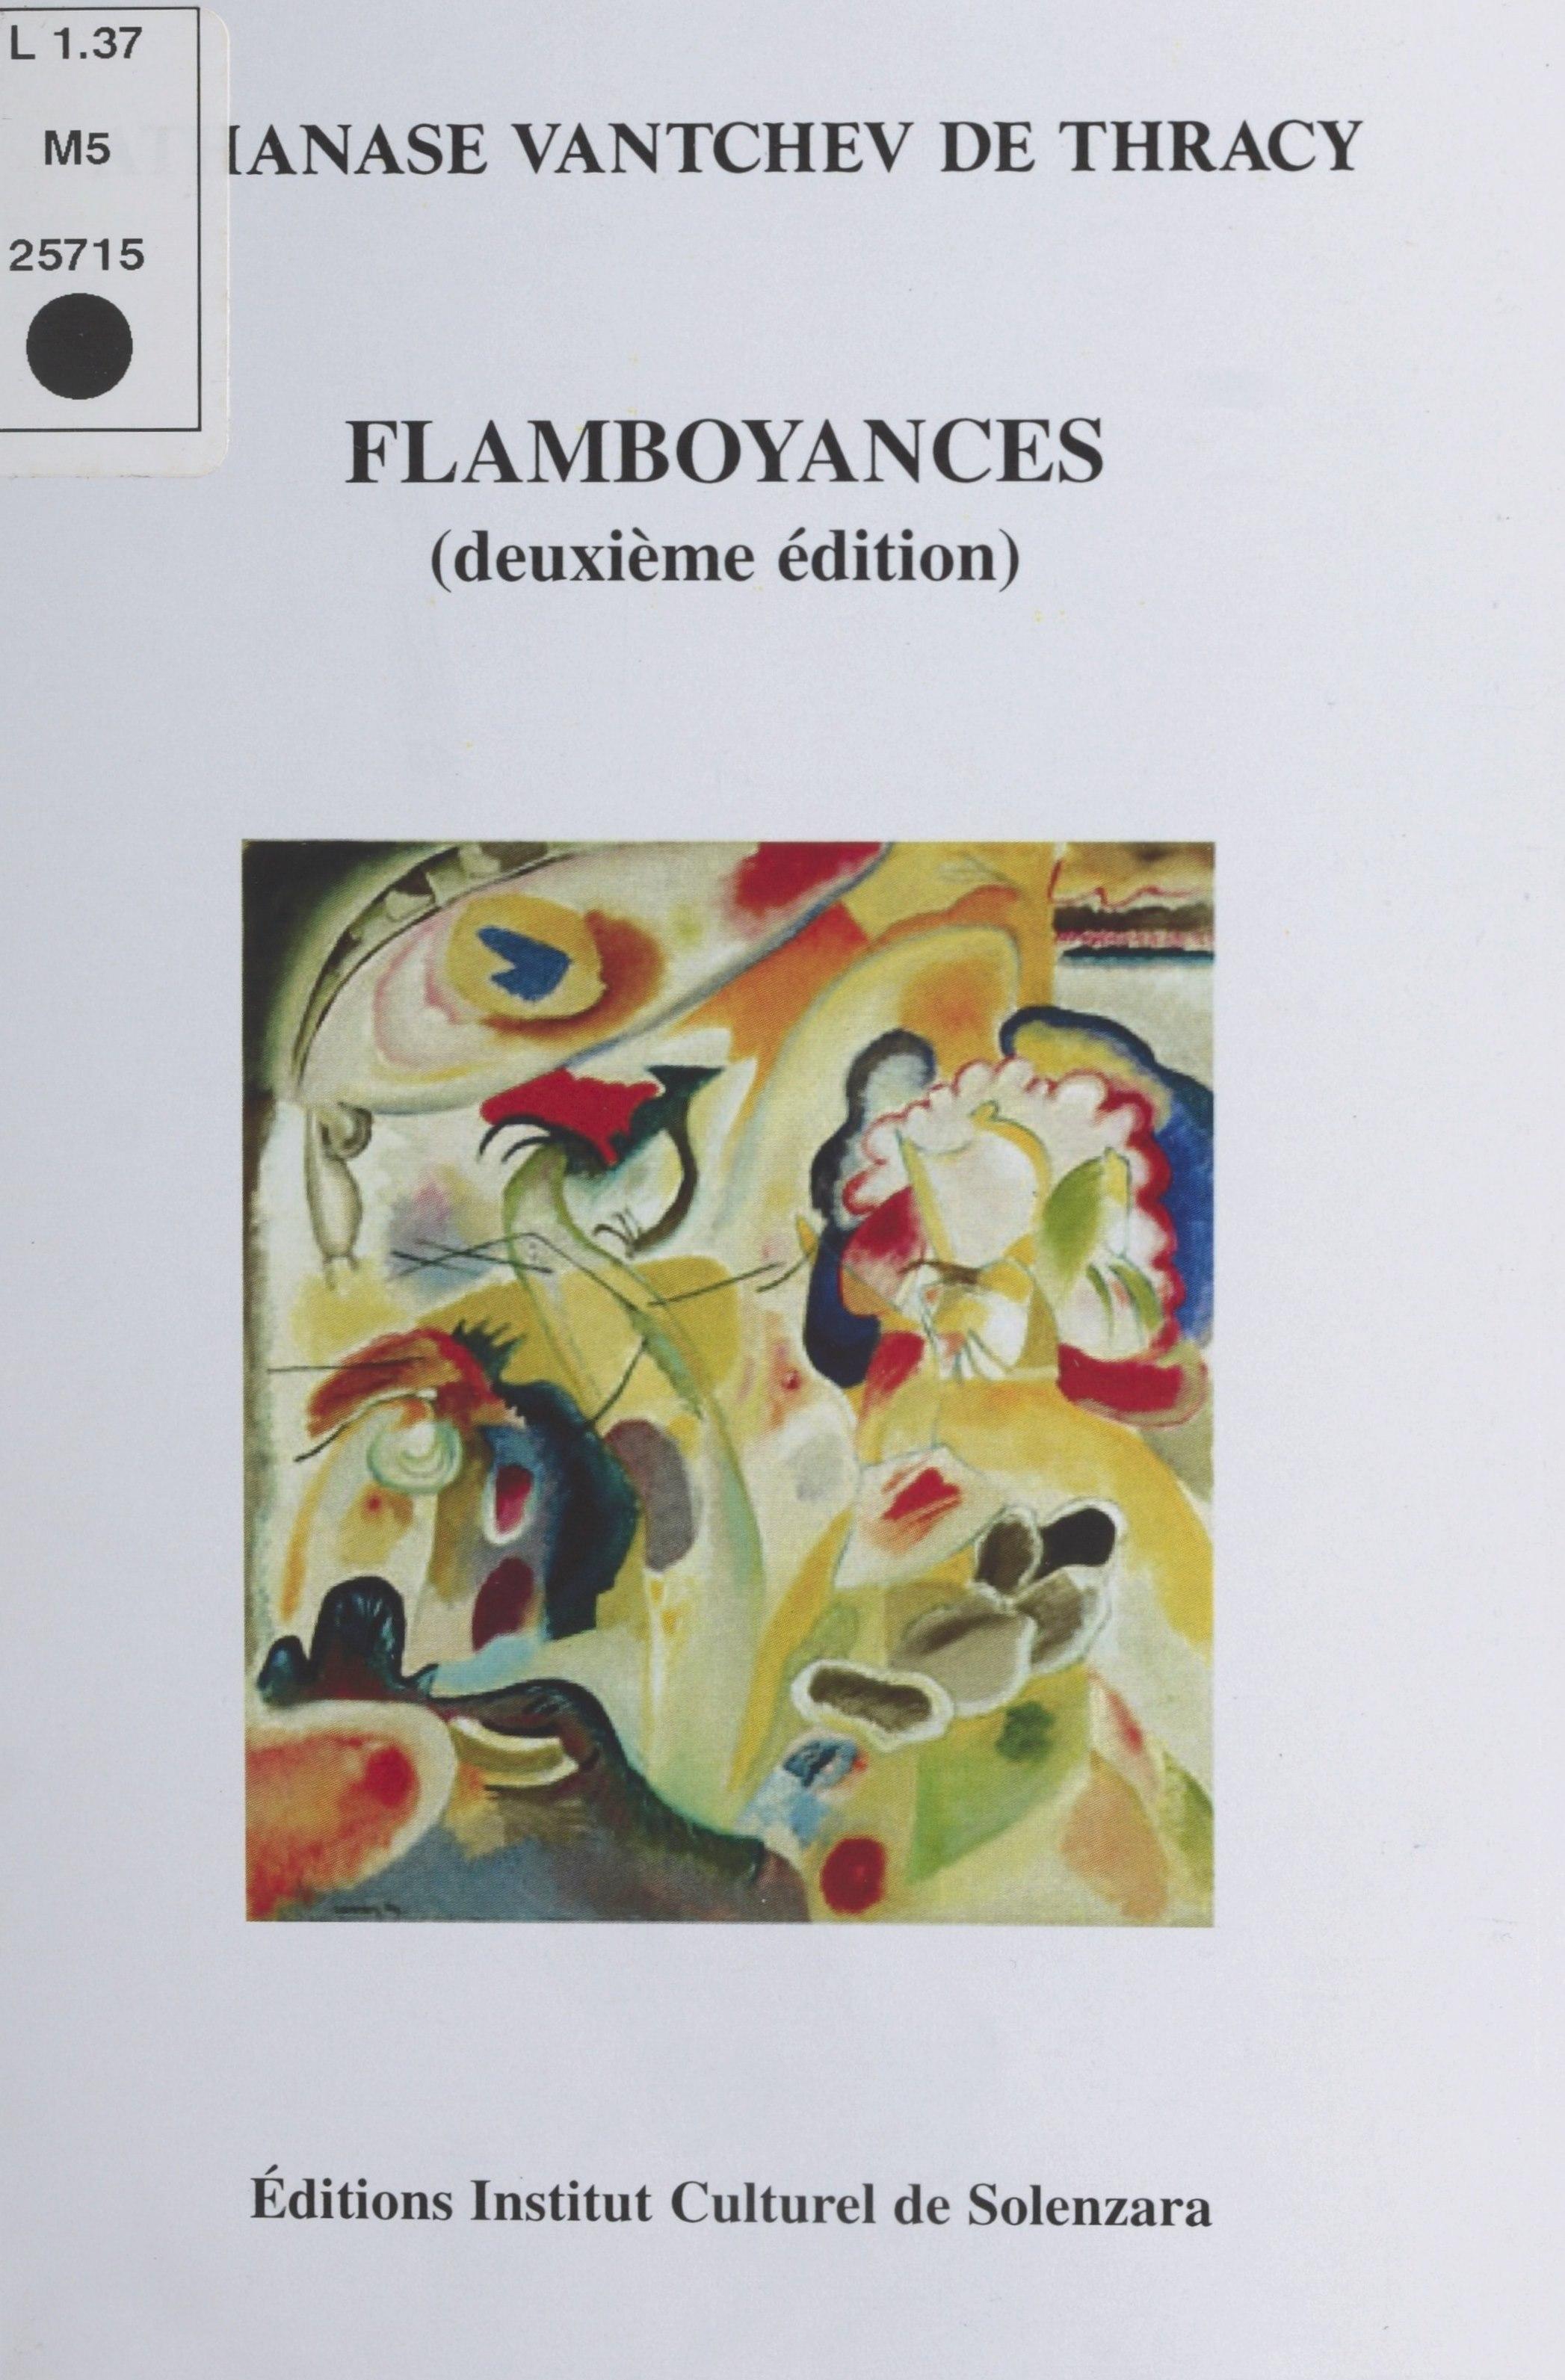 Flamboyances Éd. Institut culturel de Solenzara